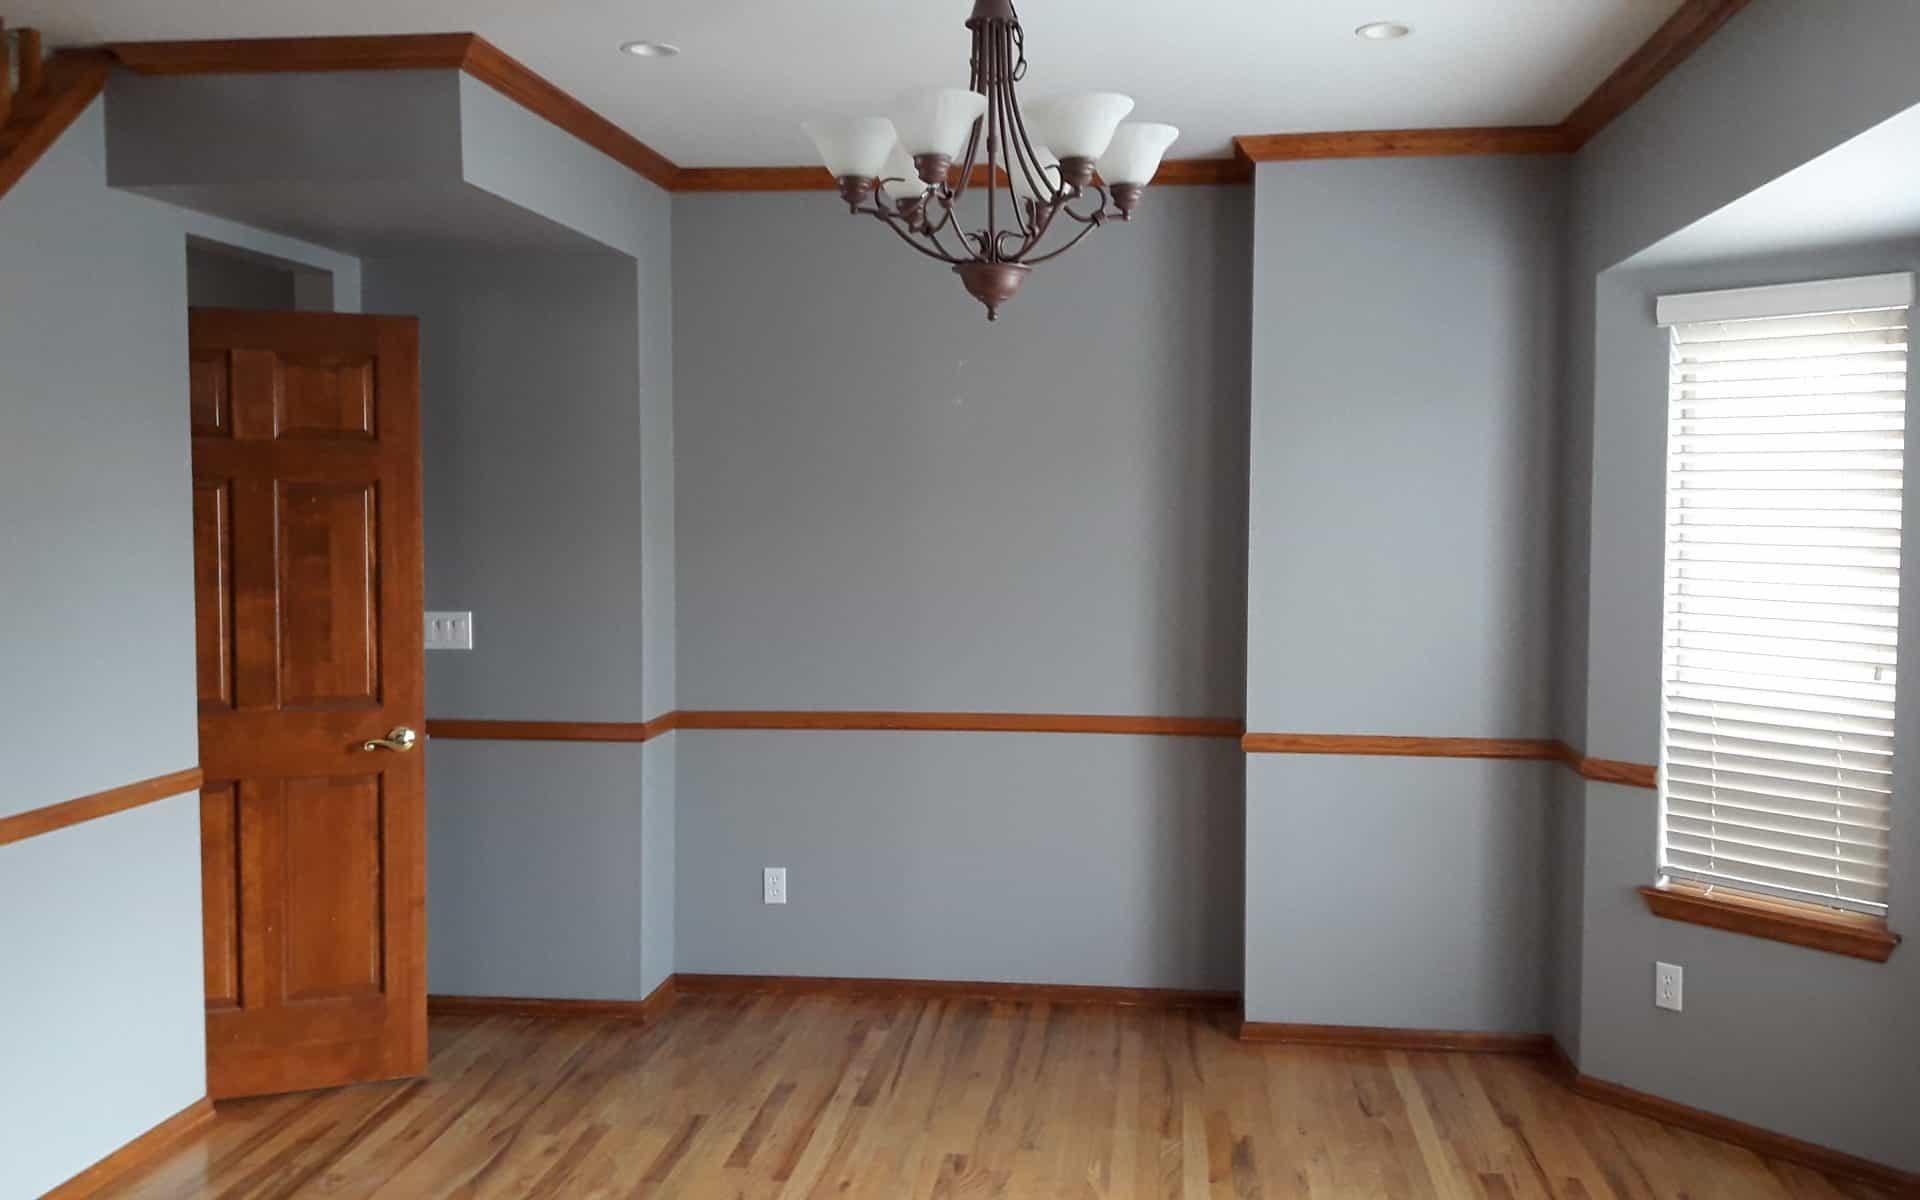 Dining room interior design before